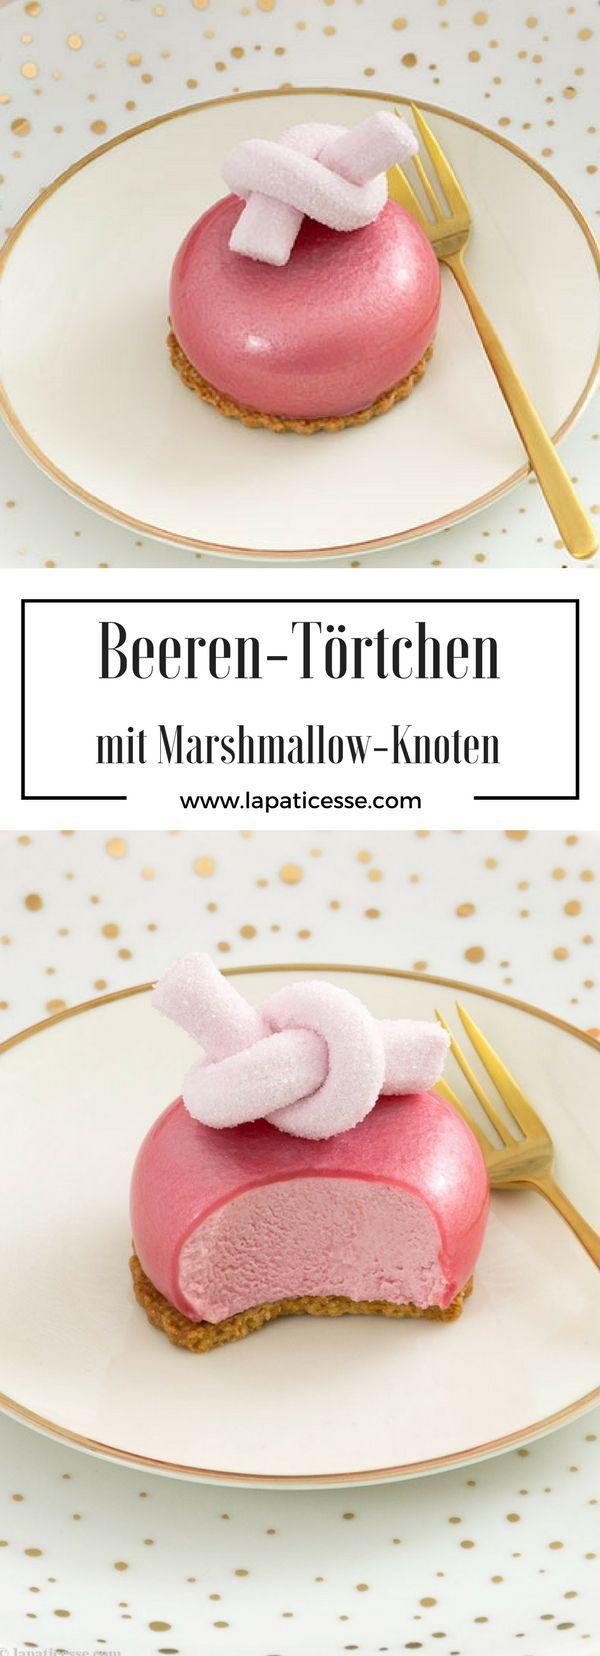 Petits gâteaux aux fruits rouges Beeren-Törtchen mit Pinot noir rosé von BREE Wein